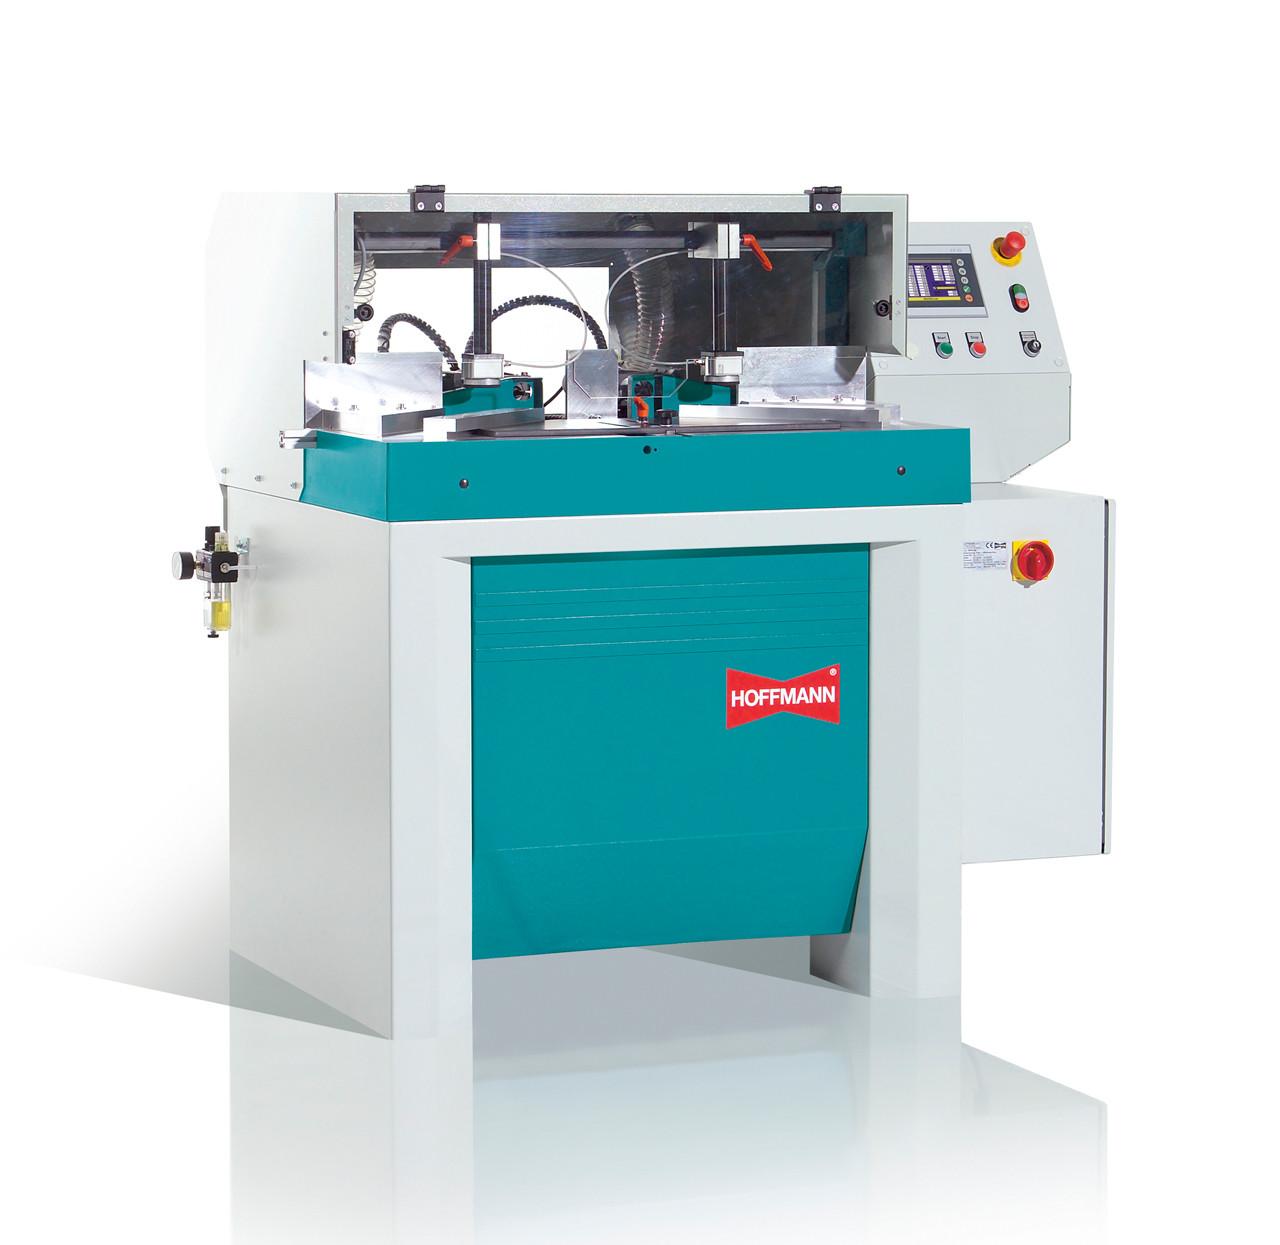 PP2NC-Hoffmann-Dovetail-Routing-Machine-W1087010